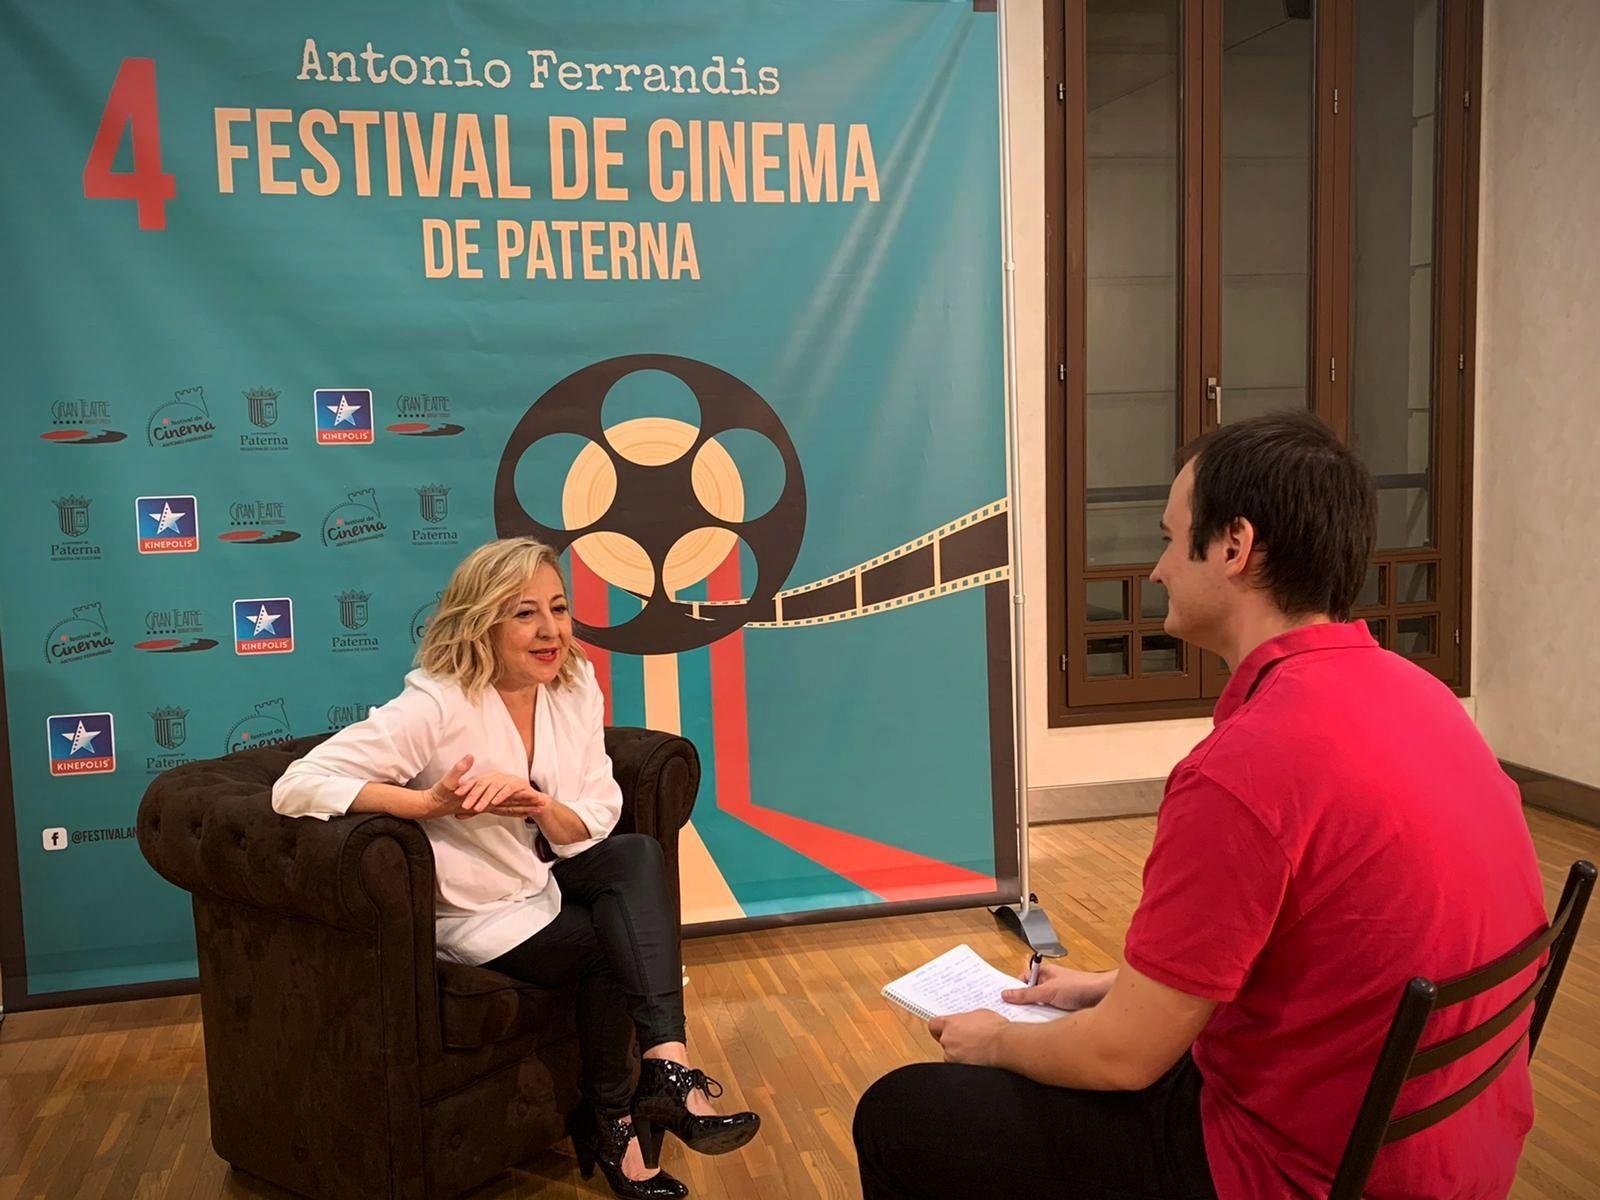 Uiso Crespo ha podido entrevistar a actores y actrices de primer nivel.